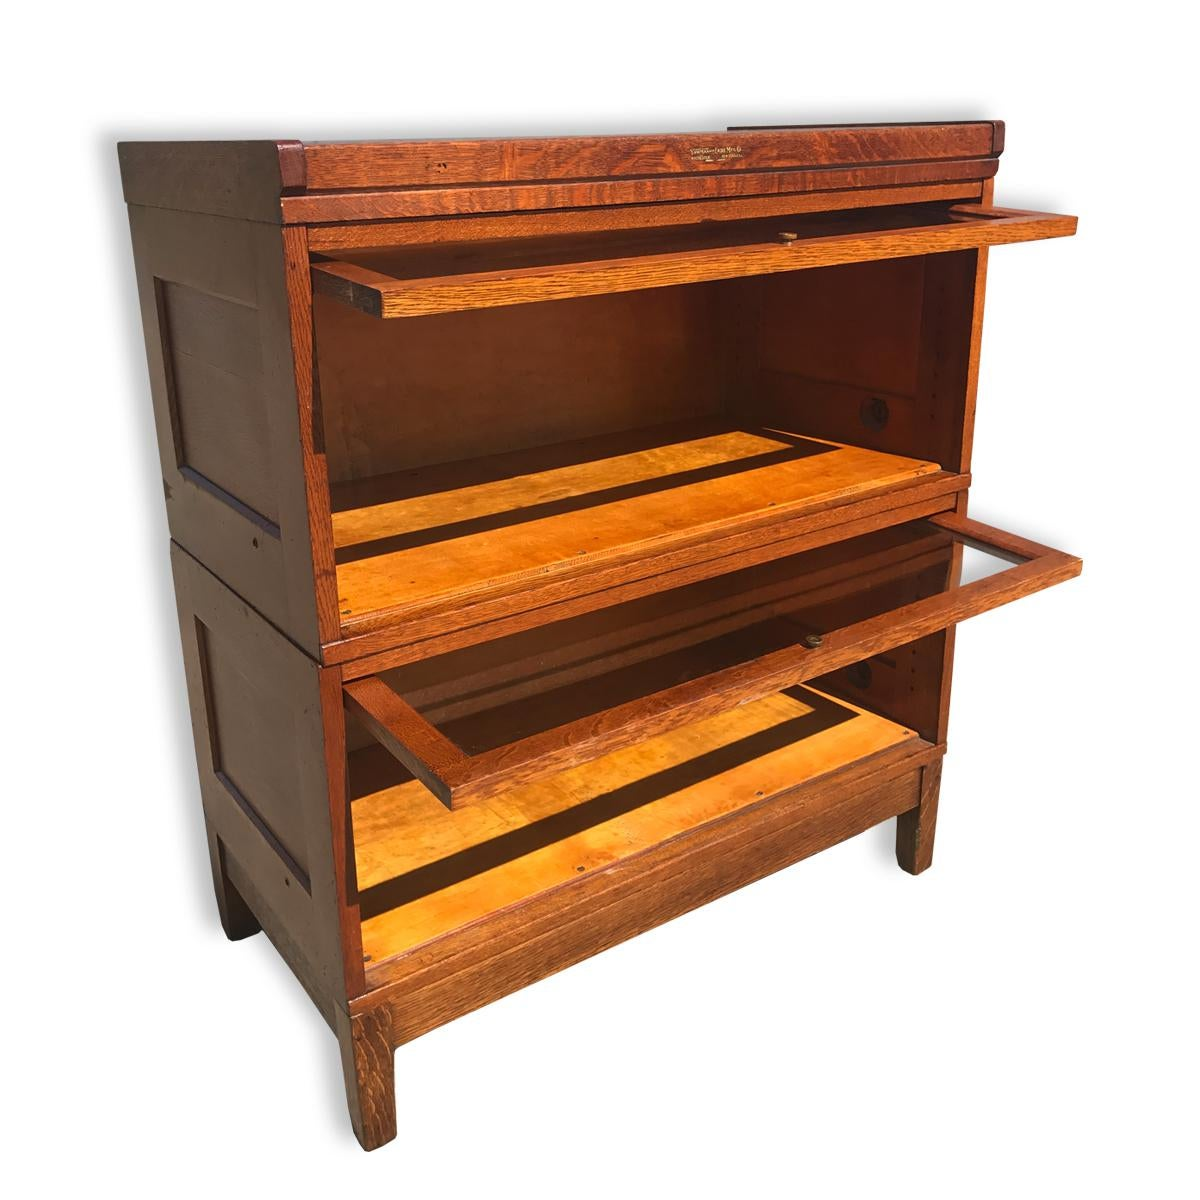 antique yawman u0026 erbe 2 stack barrister bookcase mission oak arts and crafts image 2